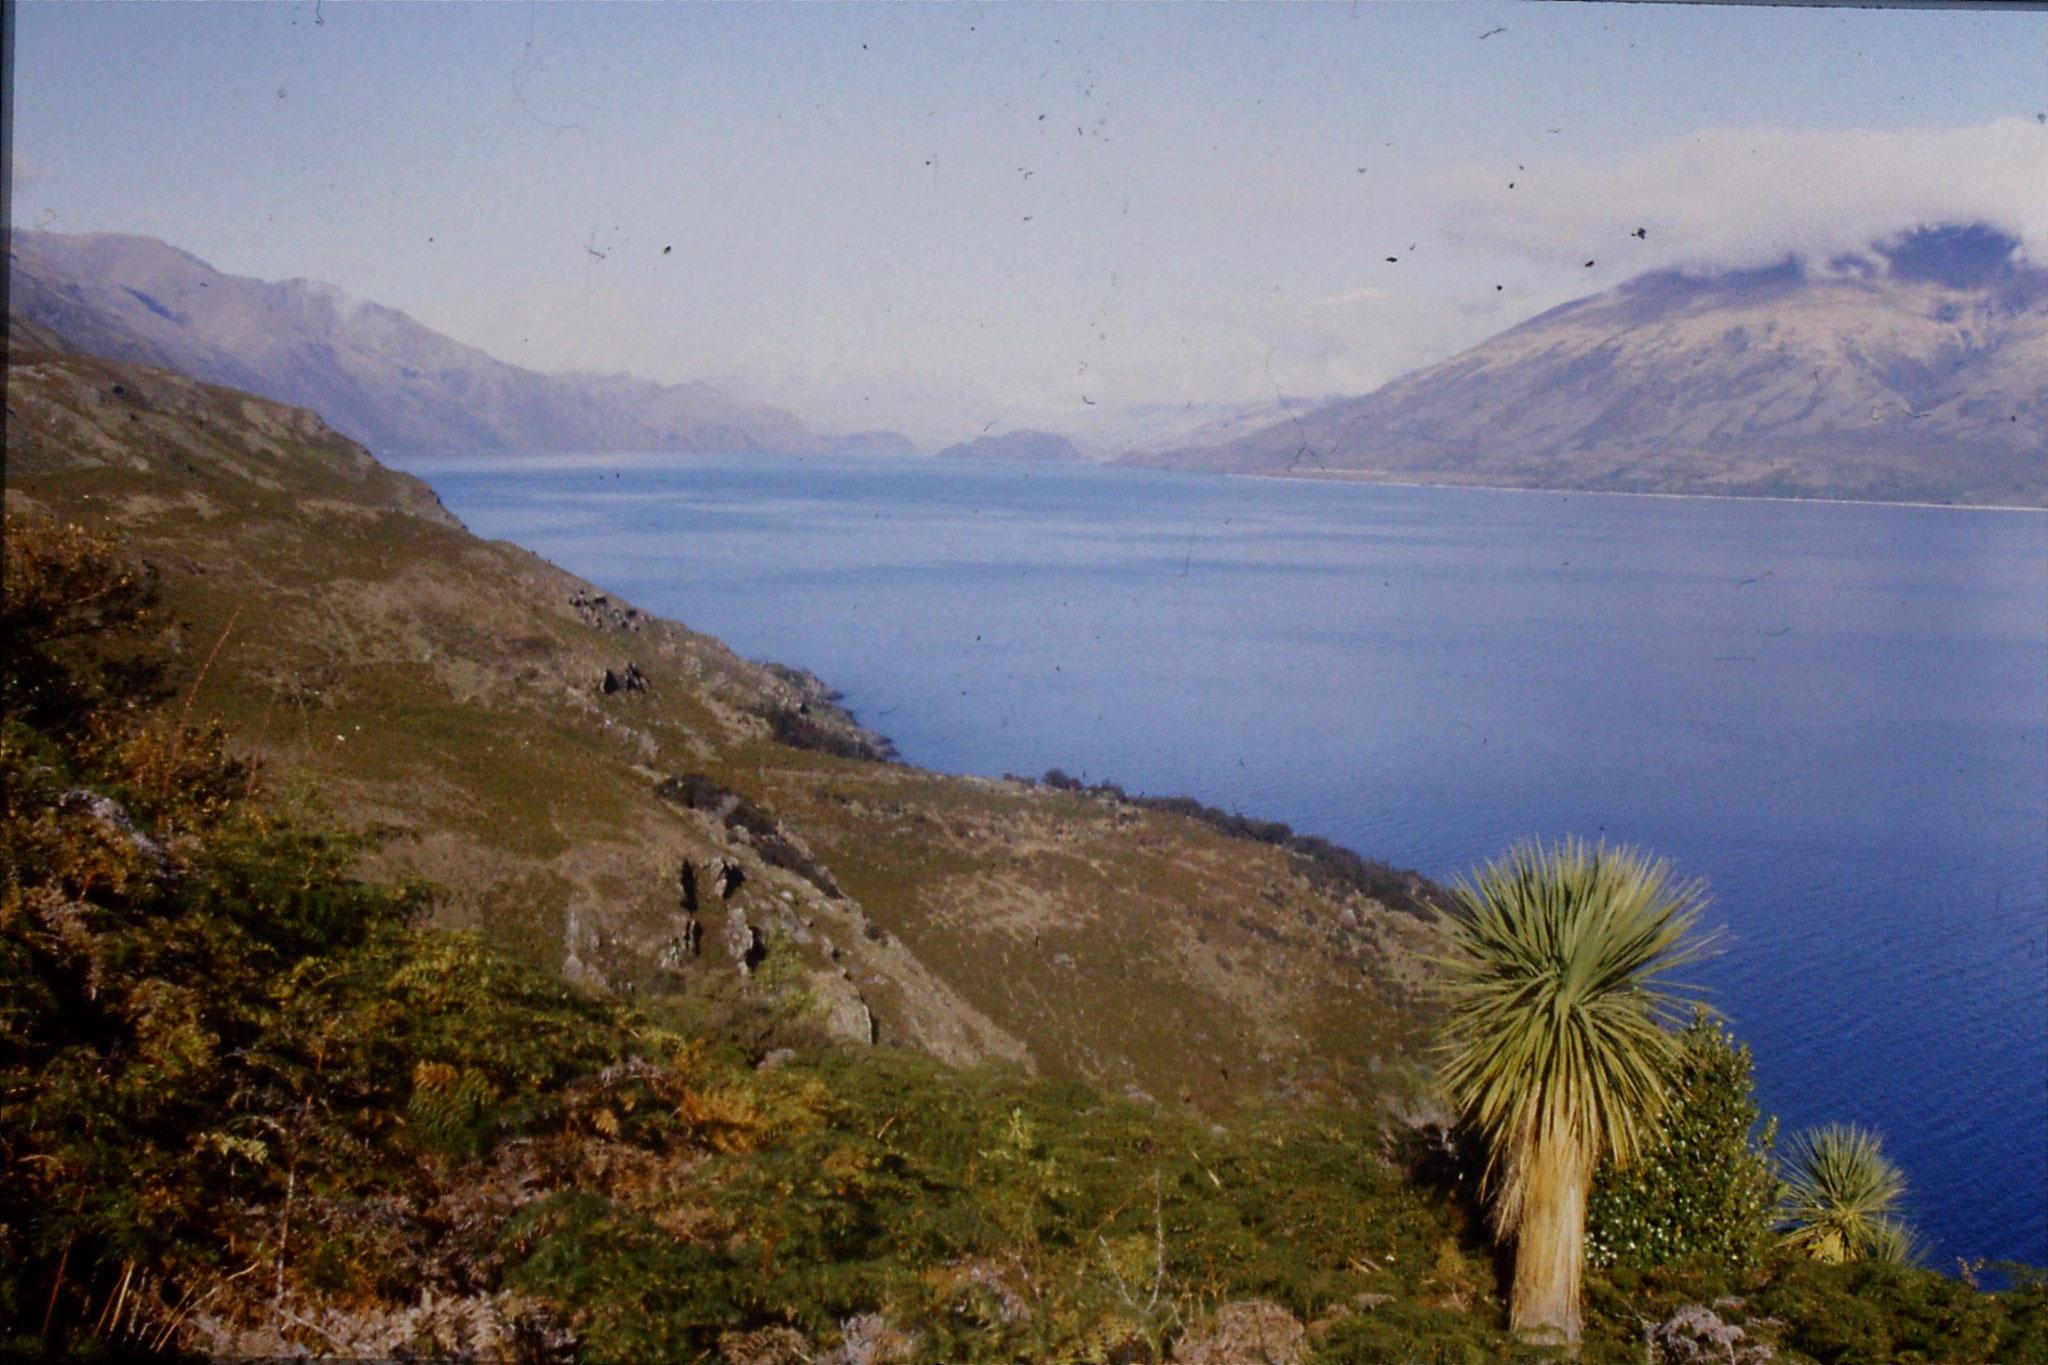 21/8/1990: 24: Lake Wanaka